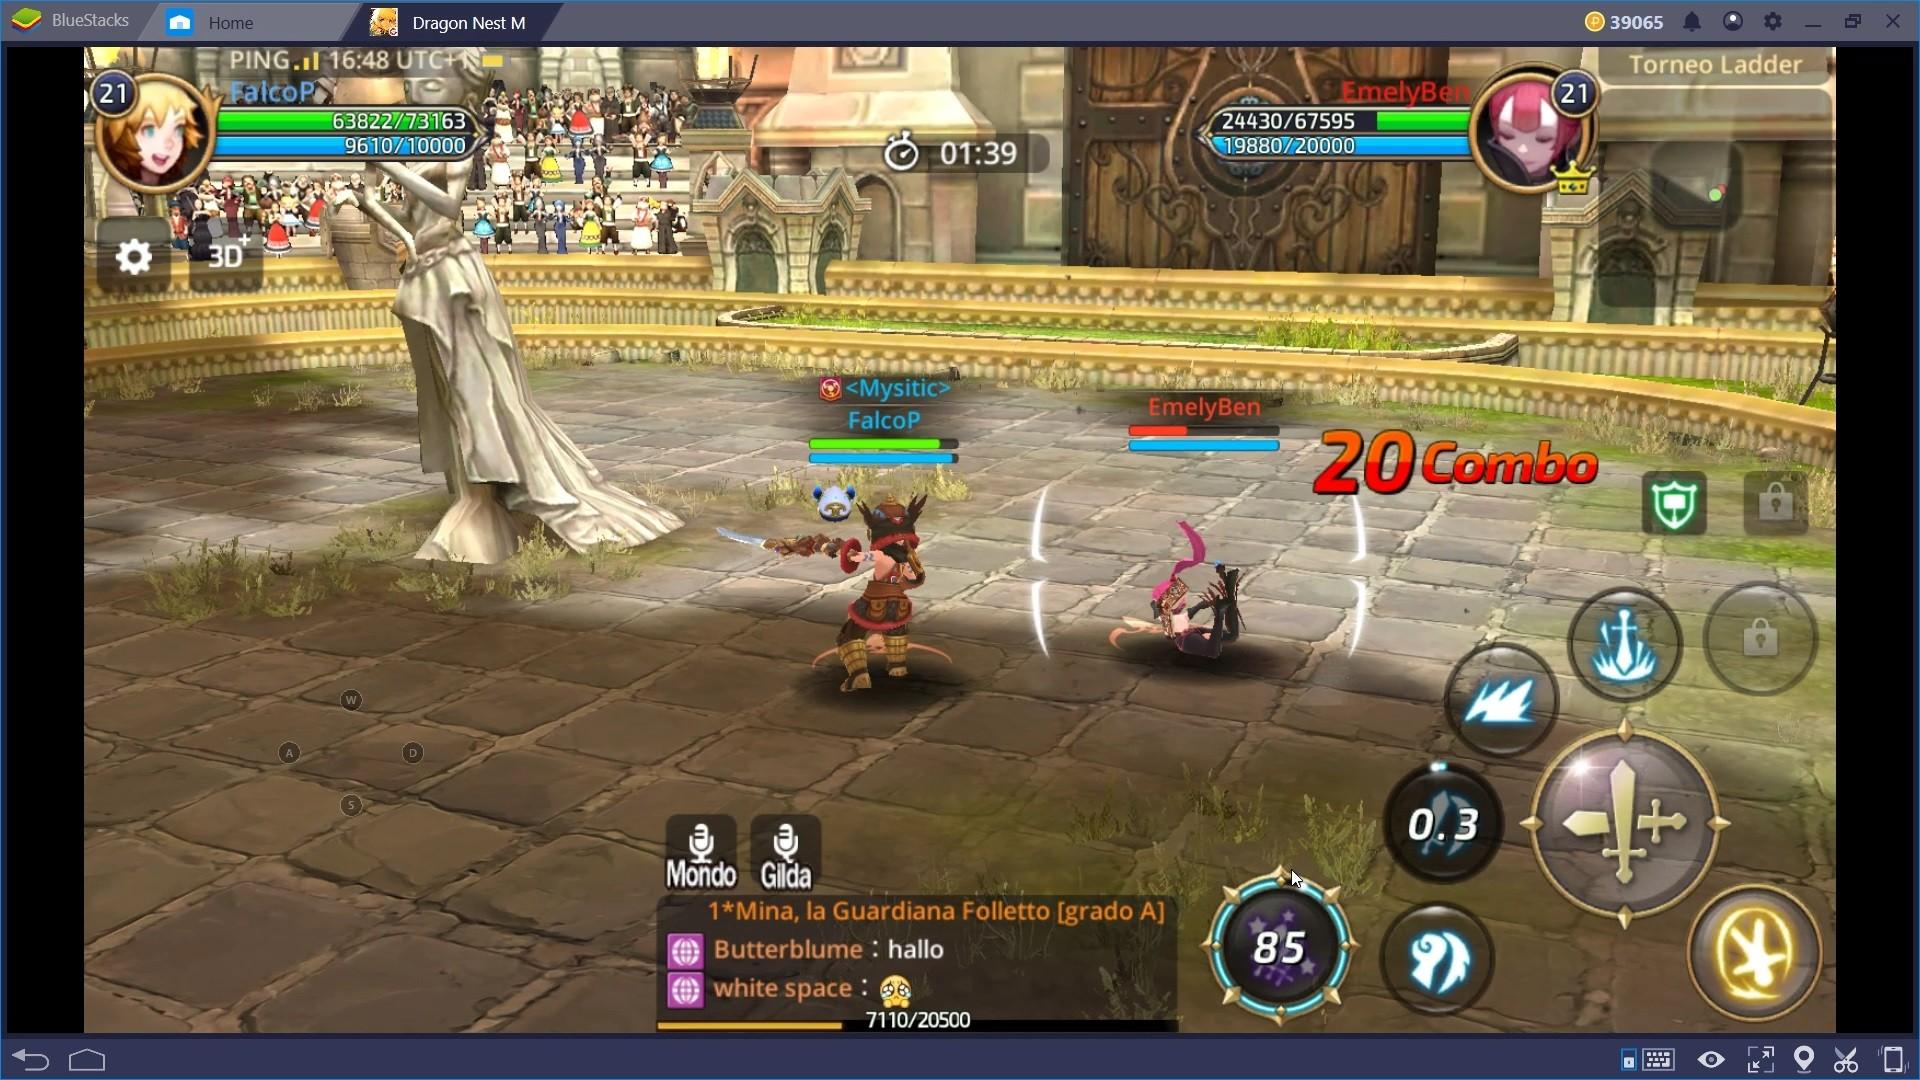 Dragon Nest M: Combattere nel PvE e PvP